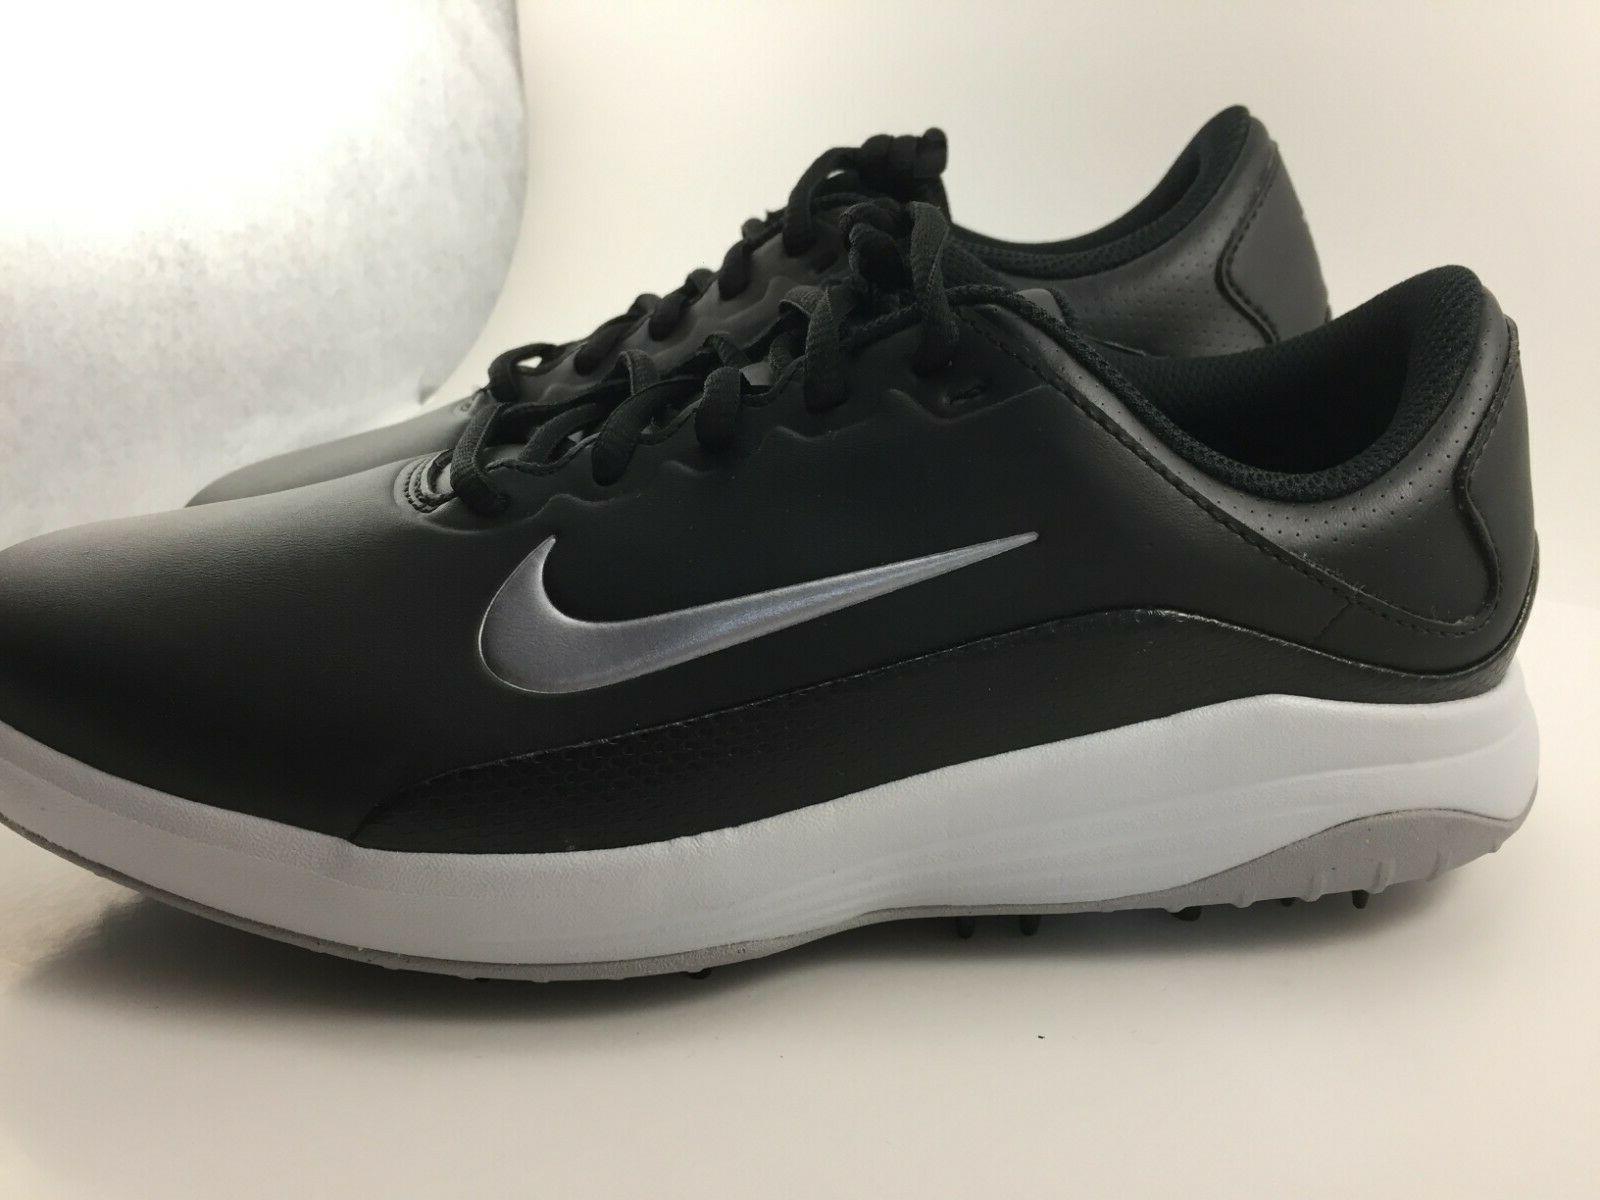 Nike Vapor Golf Shoes Black Cleats